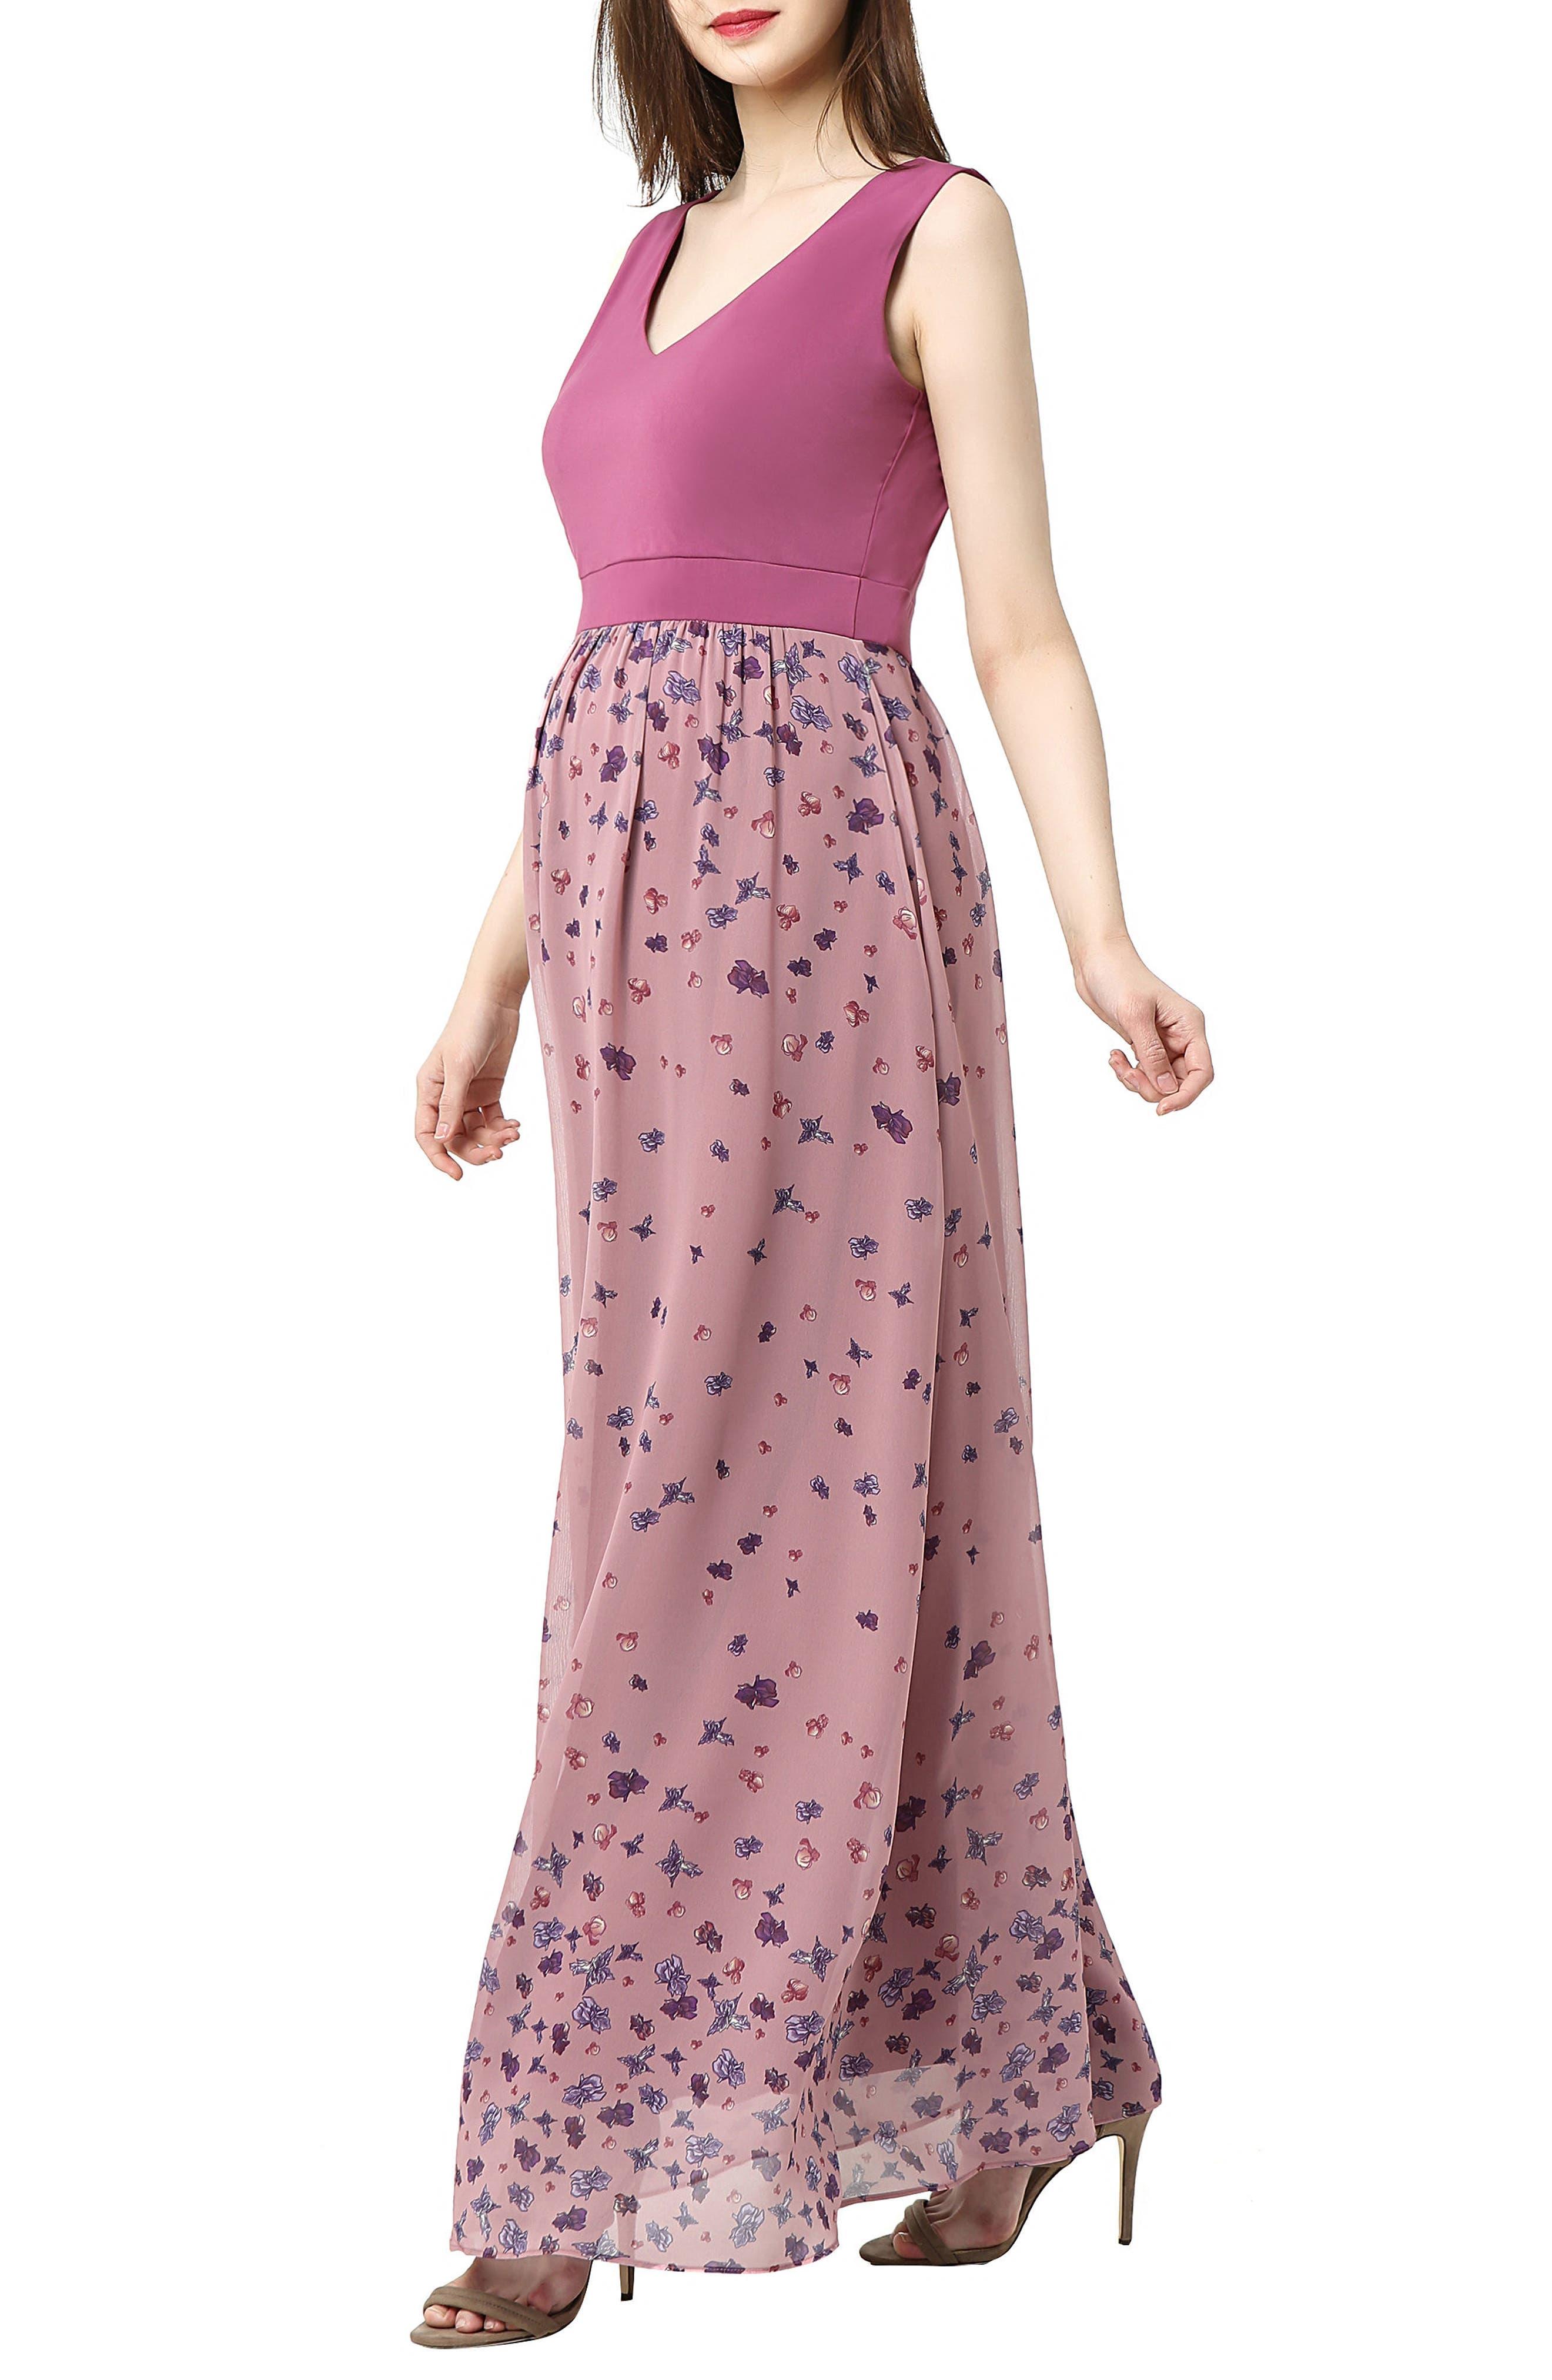 Armanda Maternity Maxi Dress,                             Alternate thumbnail 3, color,                             ROSE PINK